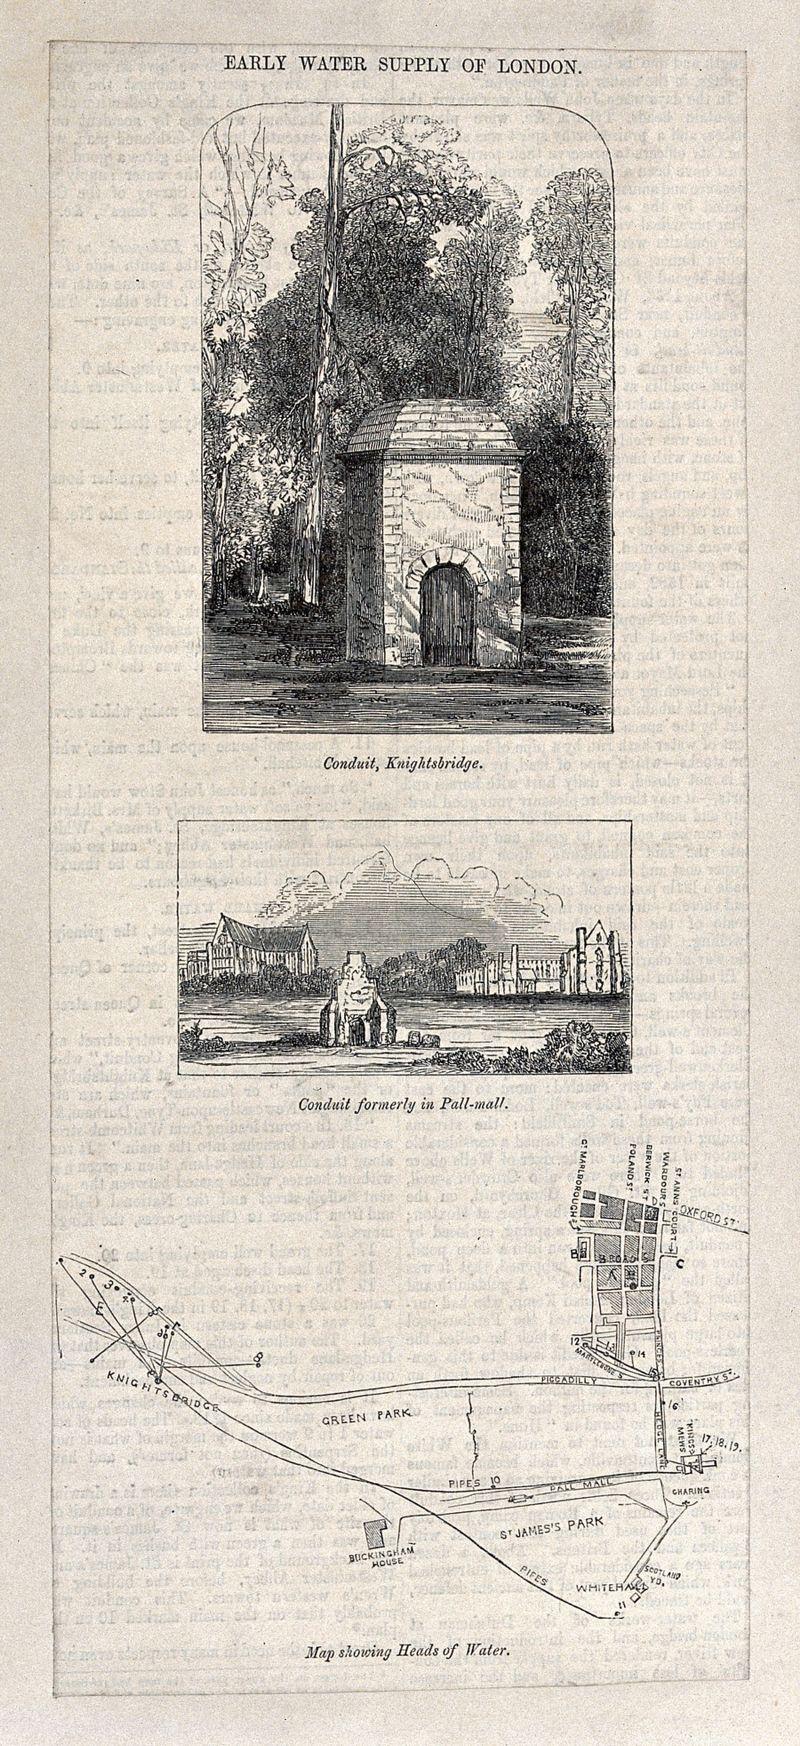 Knightsbridge London Map.Early Water Supply Of London Conduit At Knightsbridge The Conduit